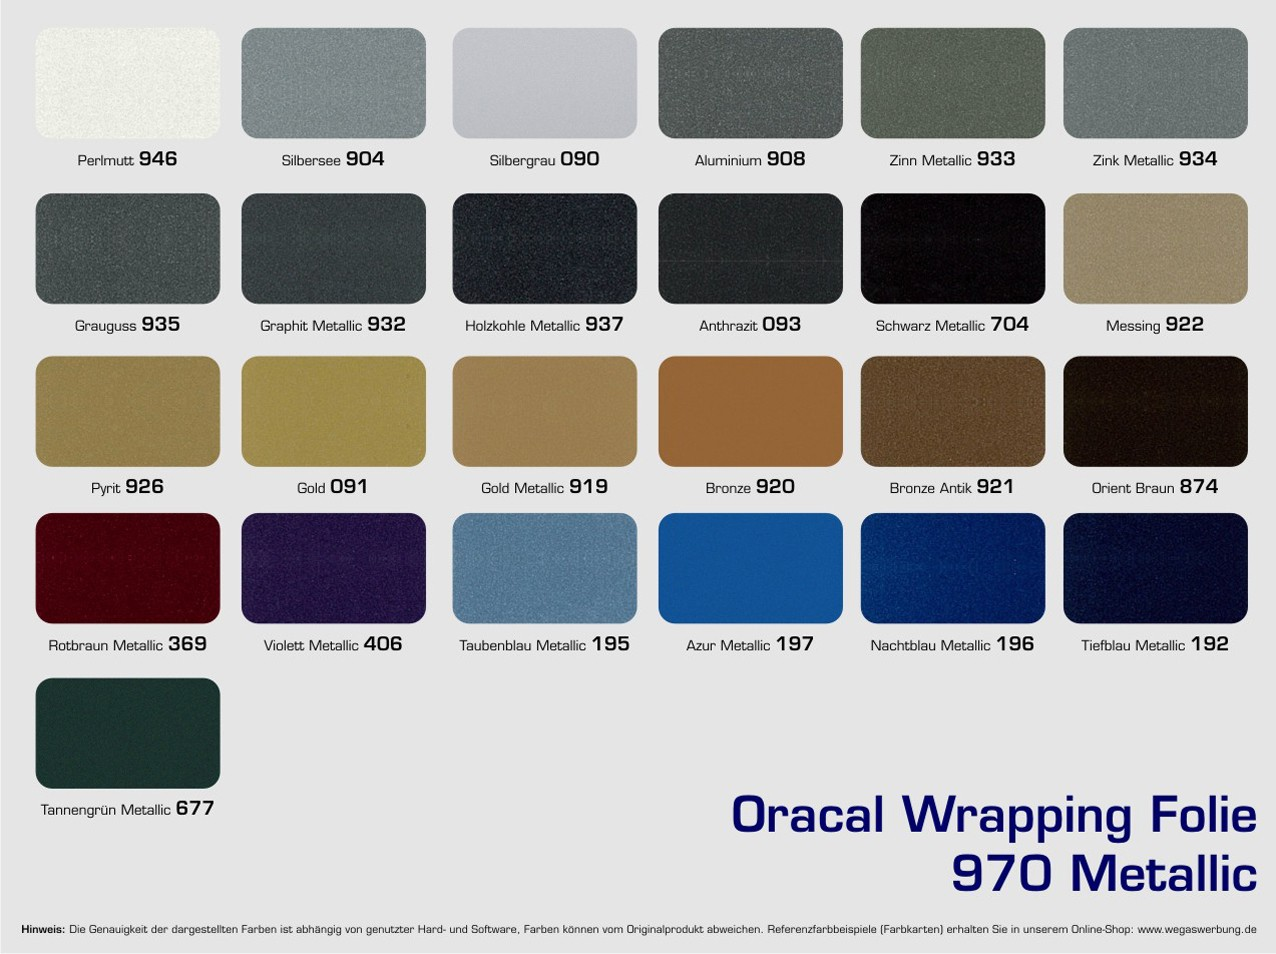 3 d autofolien oracal 970 wrappingfolien farbig glanz oder matt carbon metallic autofolien. Black Bedroom Furniture Sets. Home Design Ideas